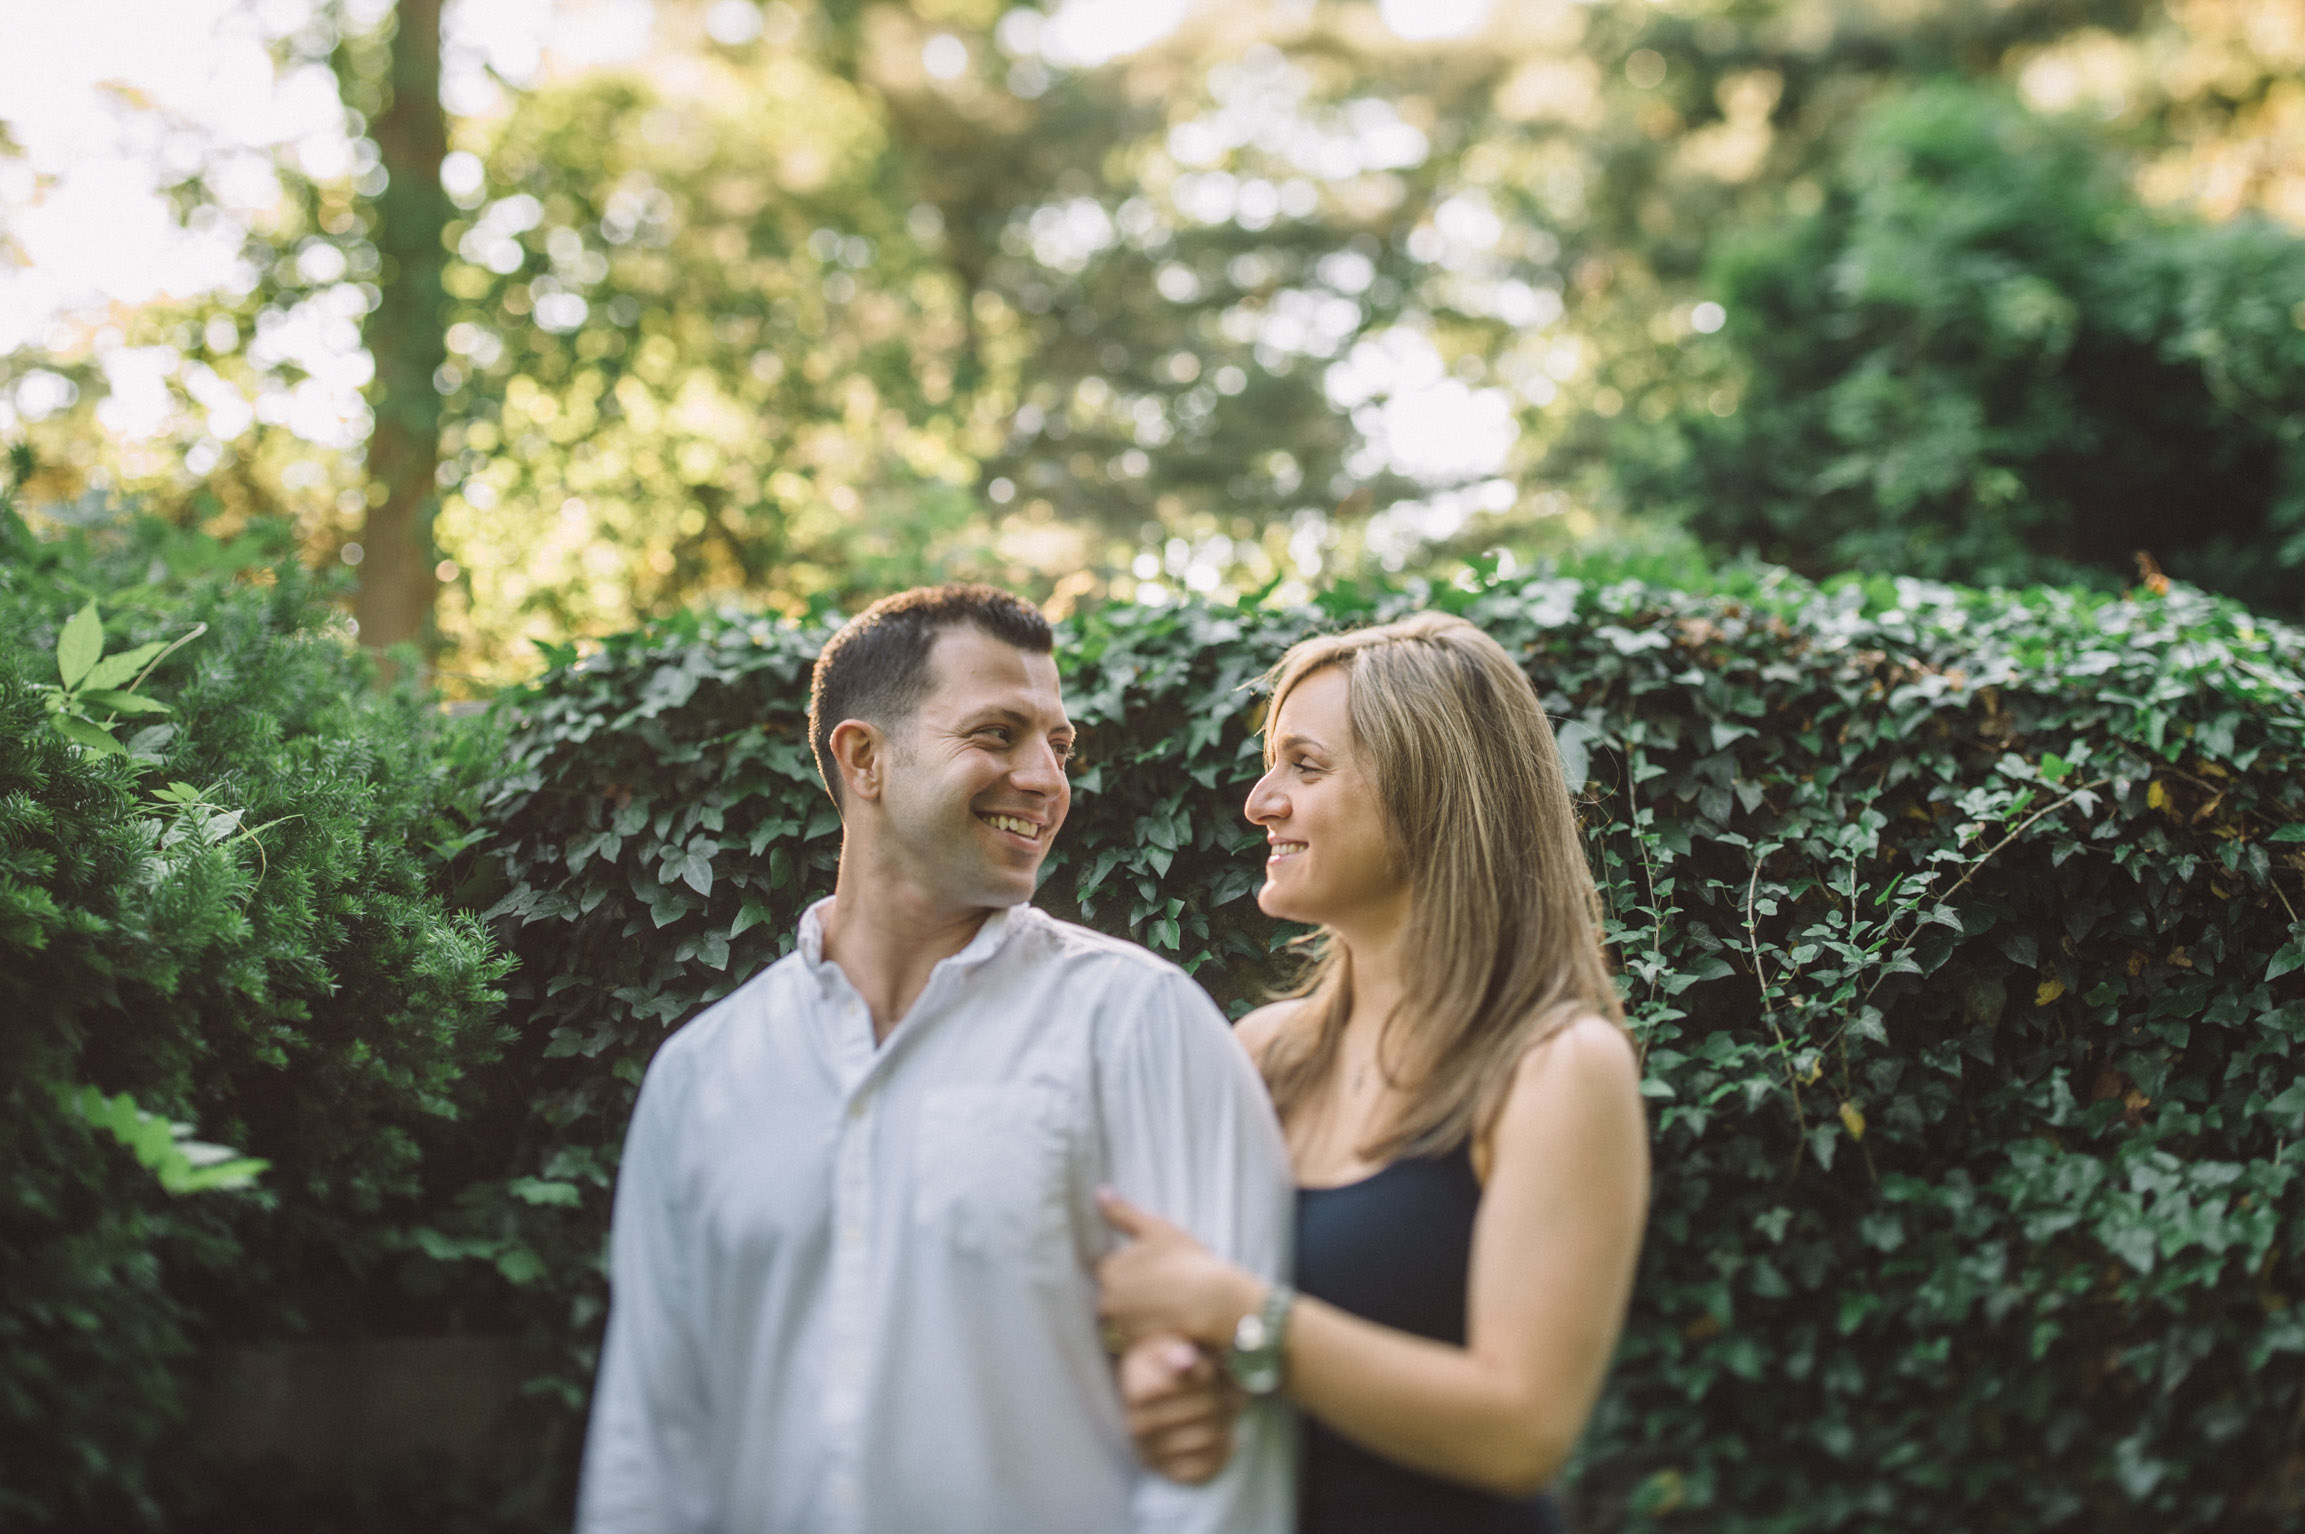 Nicole+Nick_Engagement_0015.jpg